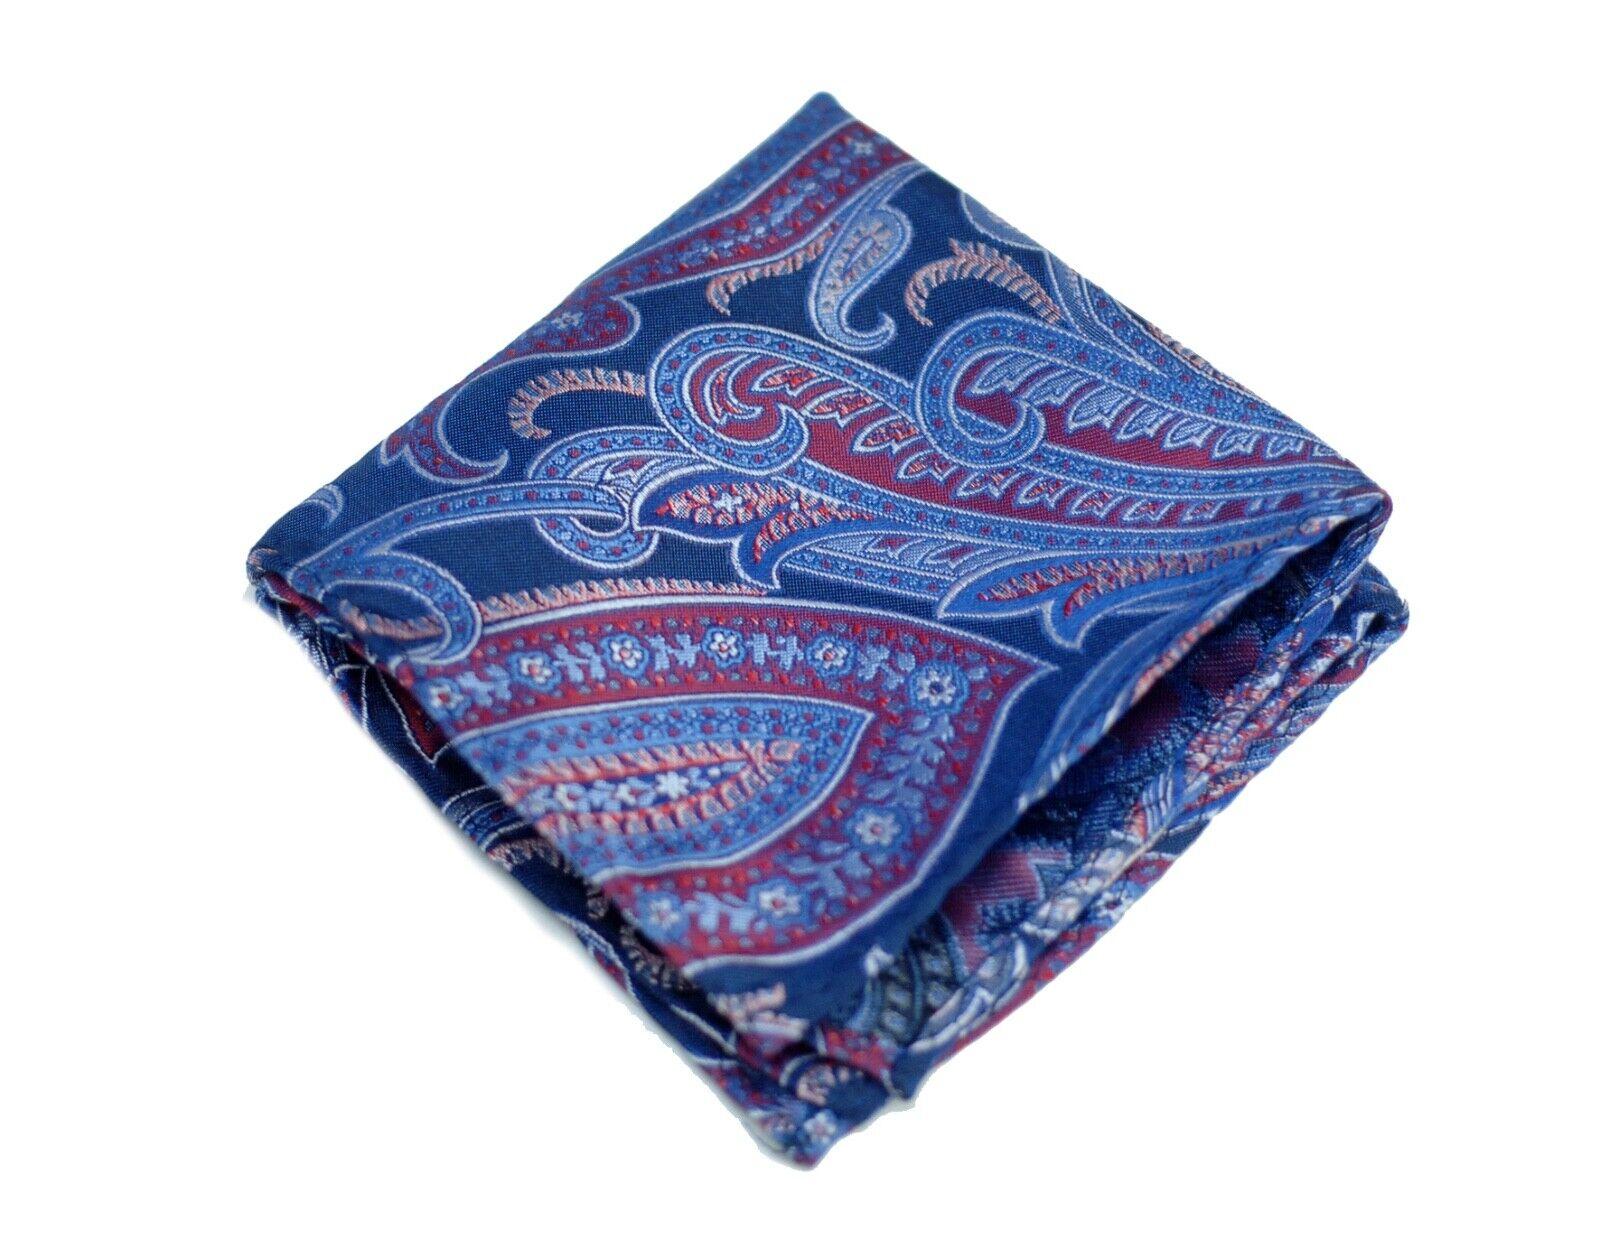 Umberto Algodon Napoli Men's Sapphire Magenta Paisley Woven Pocket Square